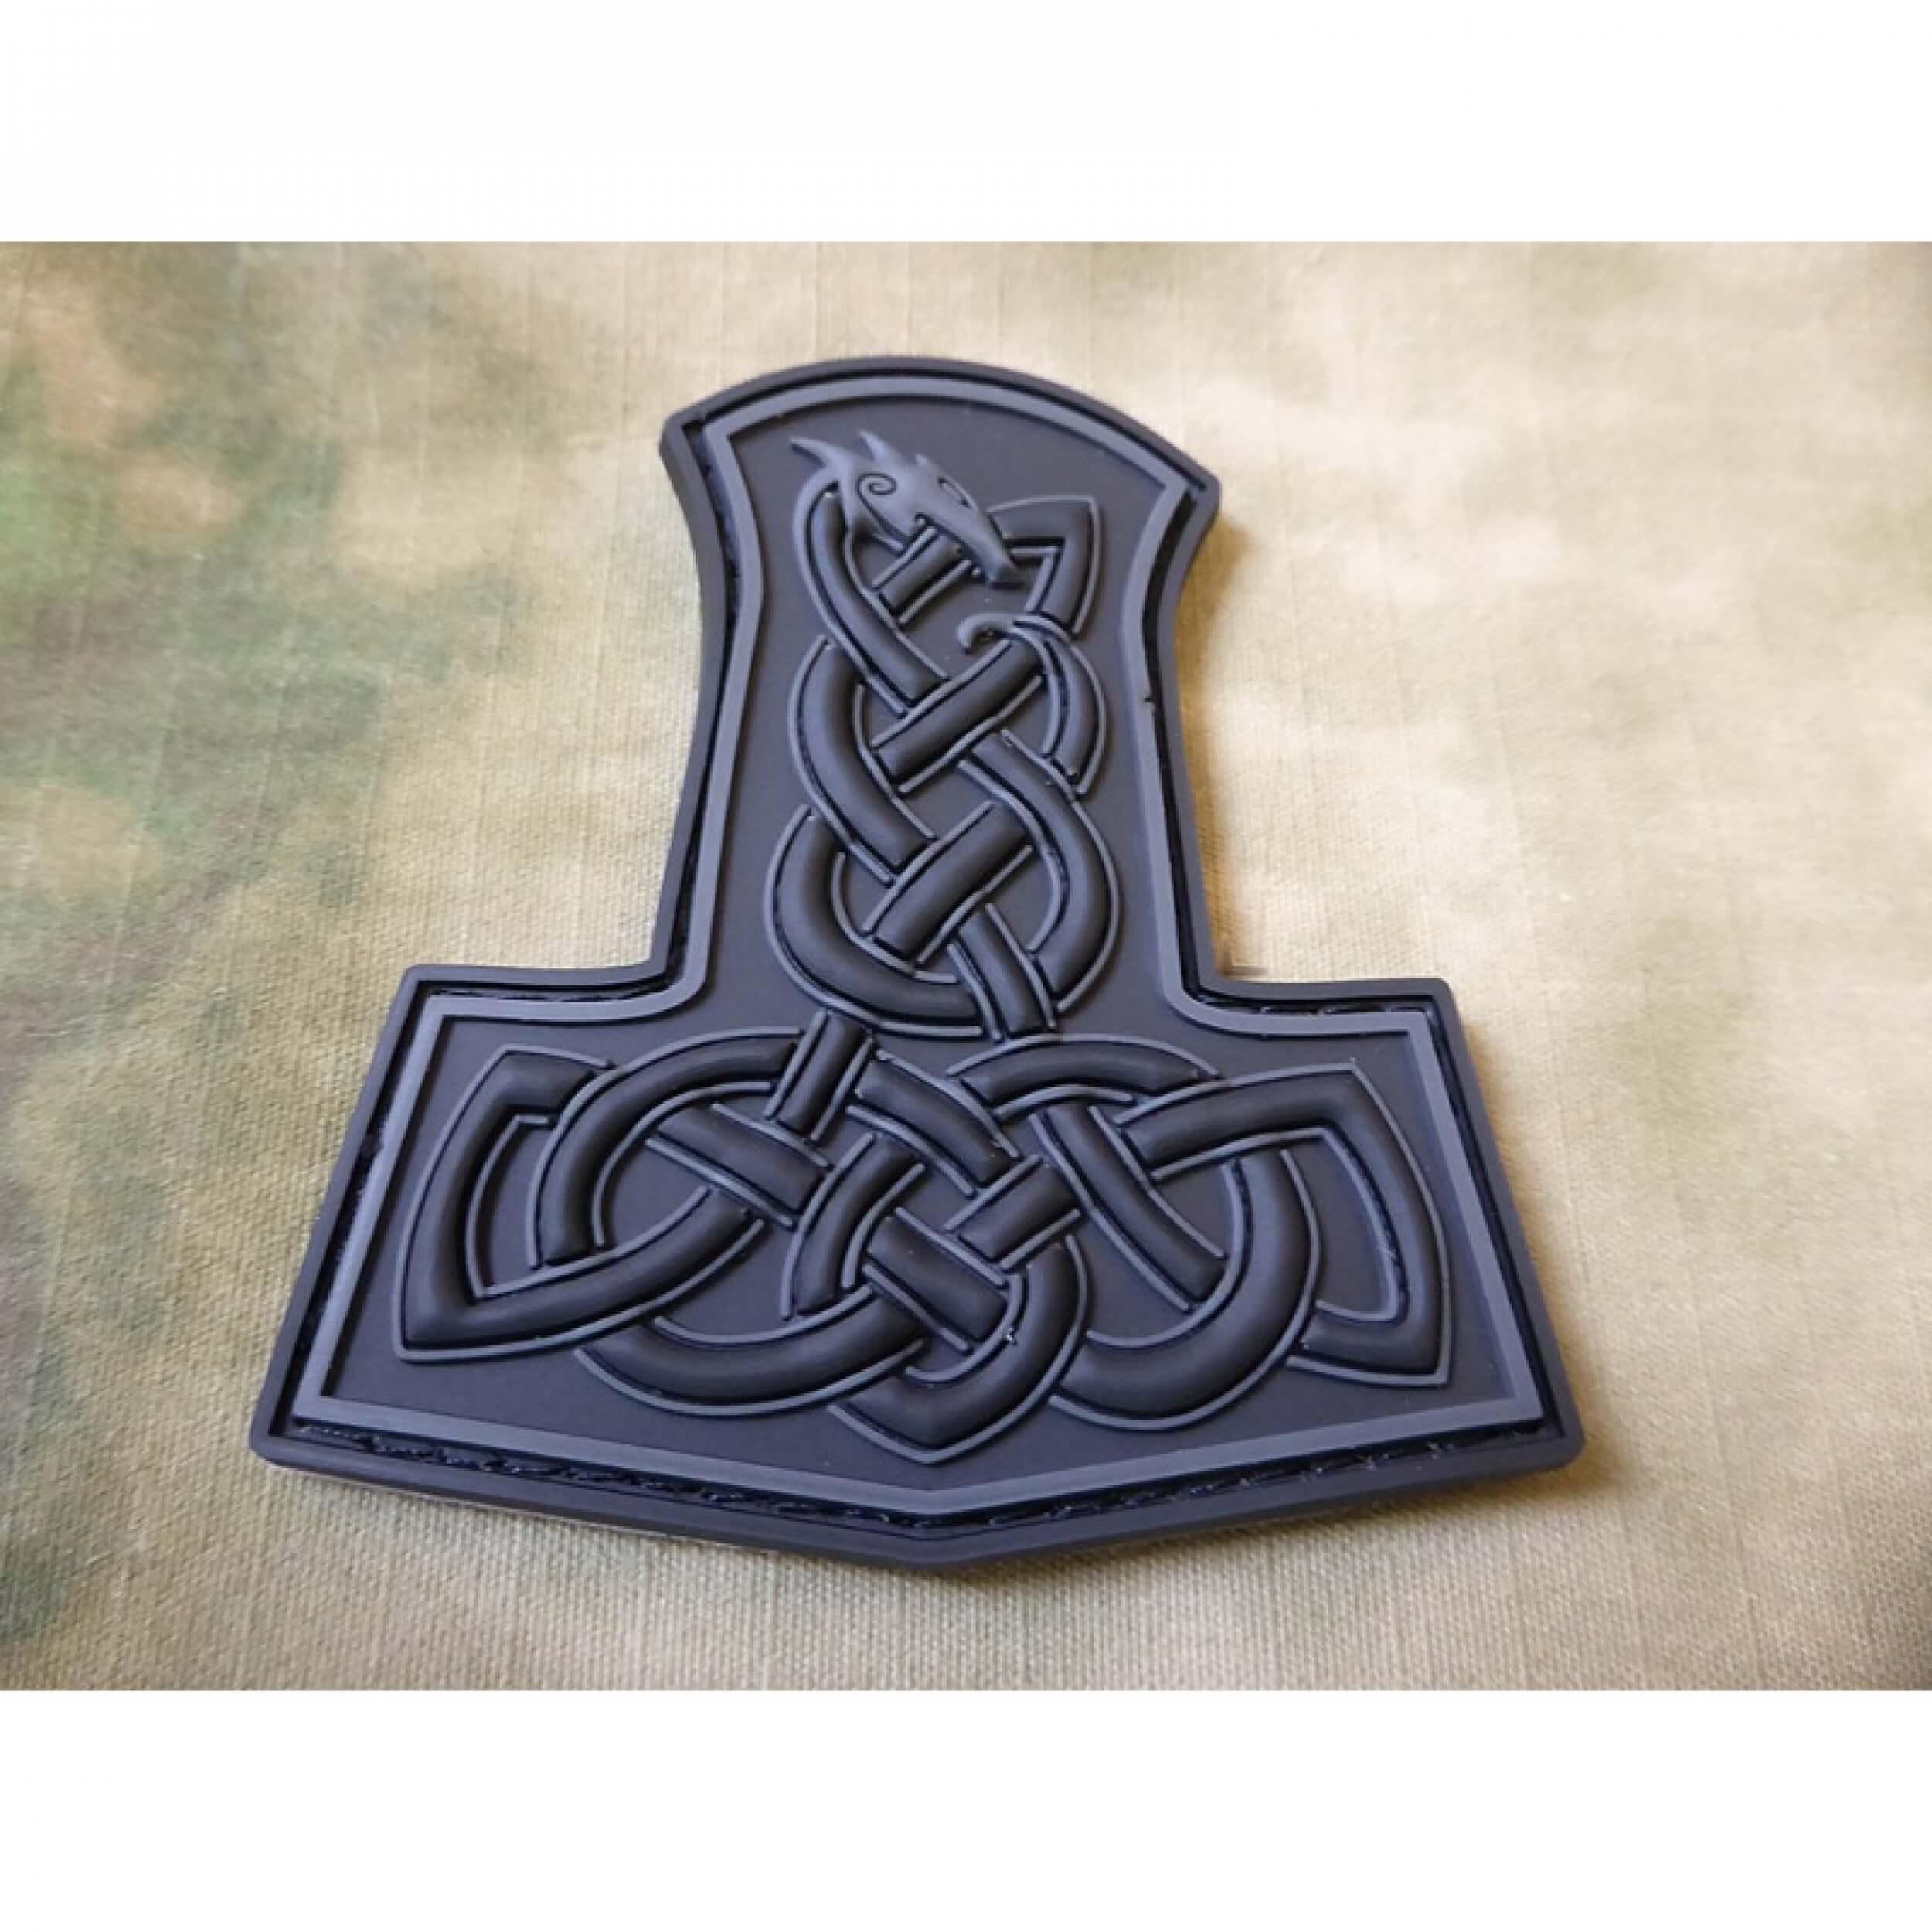 JTG Dragon Thors Hammer Patch, blackops / 3D Rubber patch